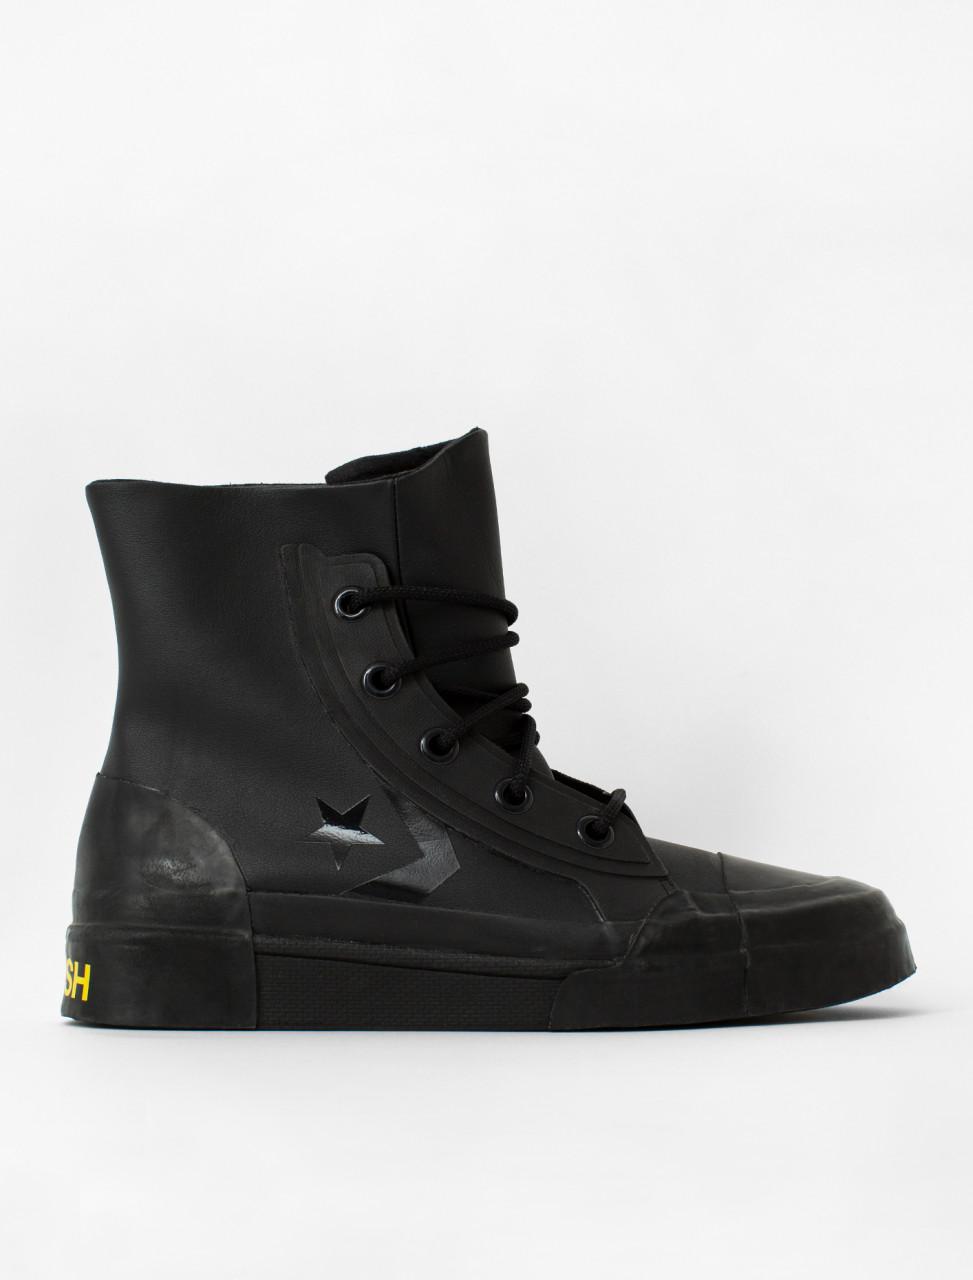 x Ambush Pro Leather High Sneaker